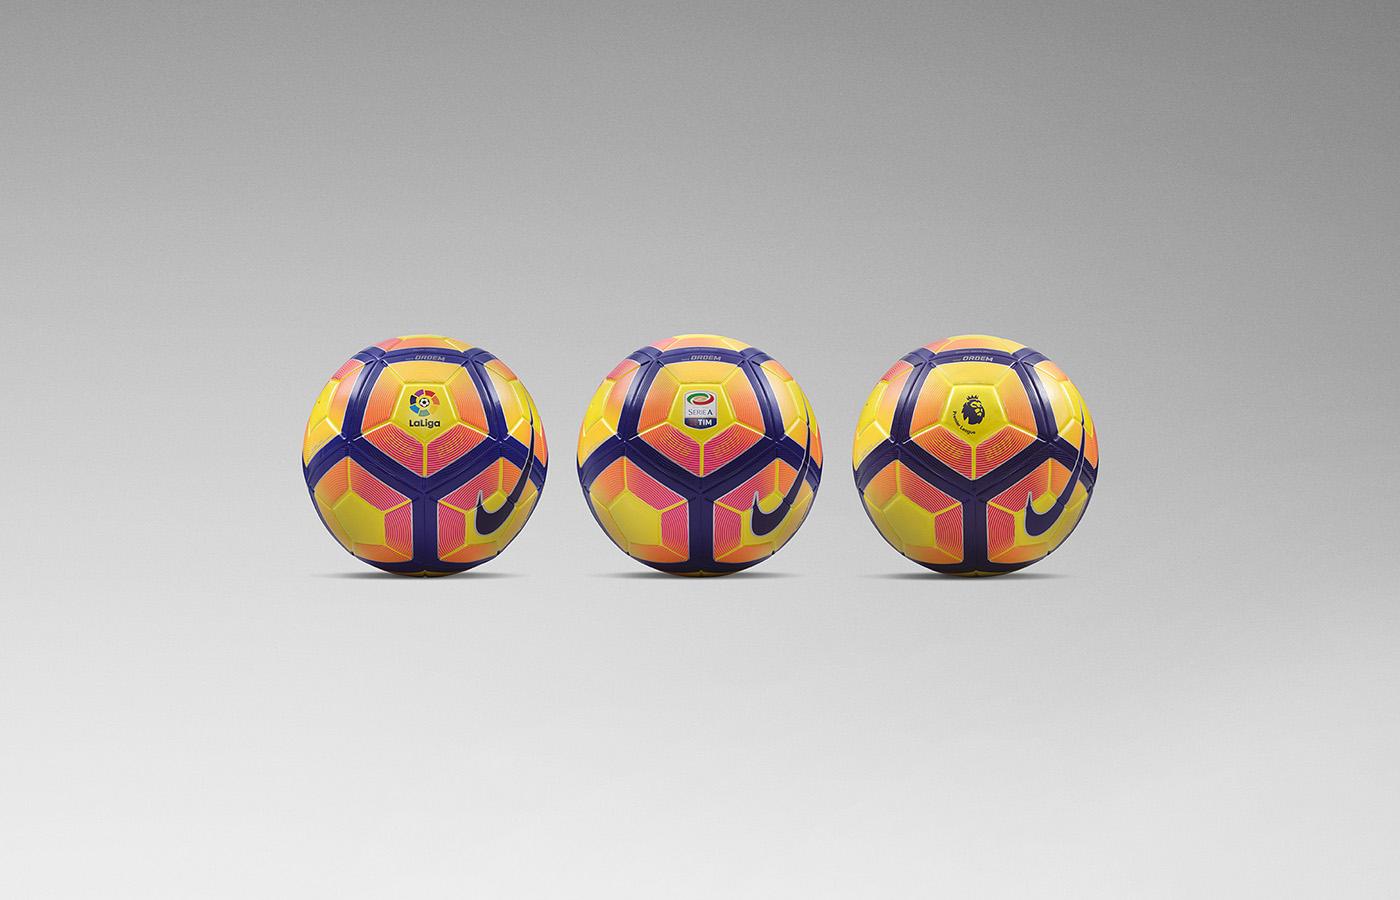 ho16_ordem_hivis_group_league_balls_62645